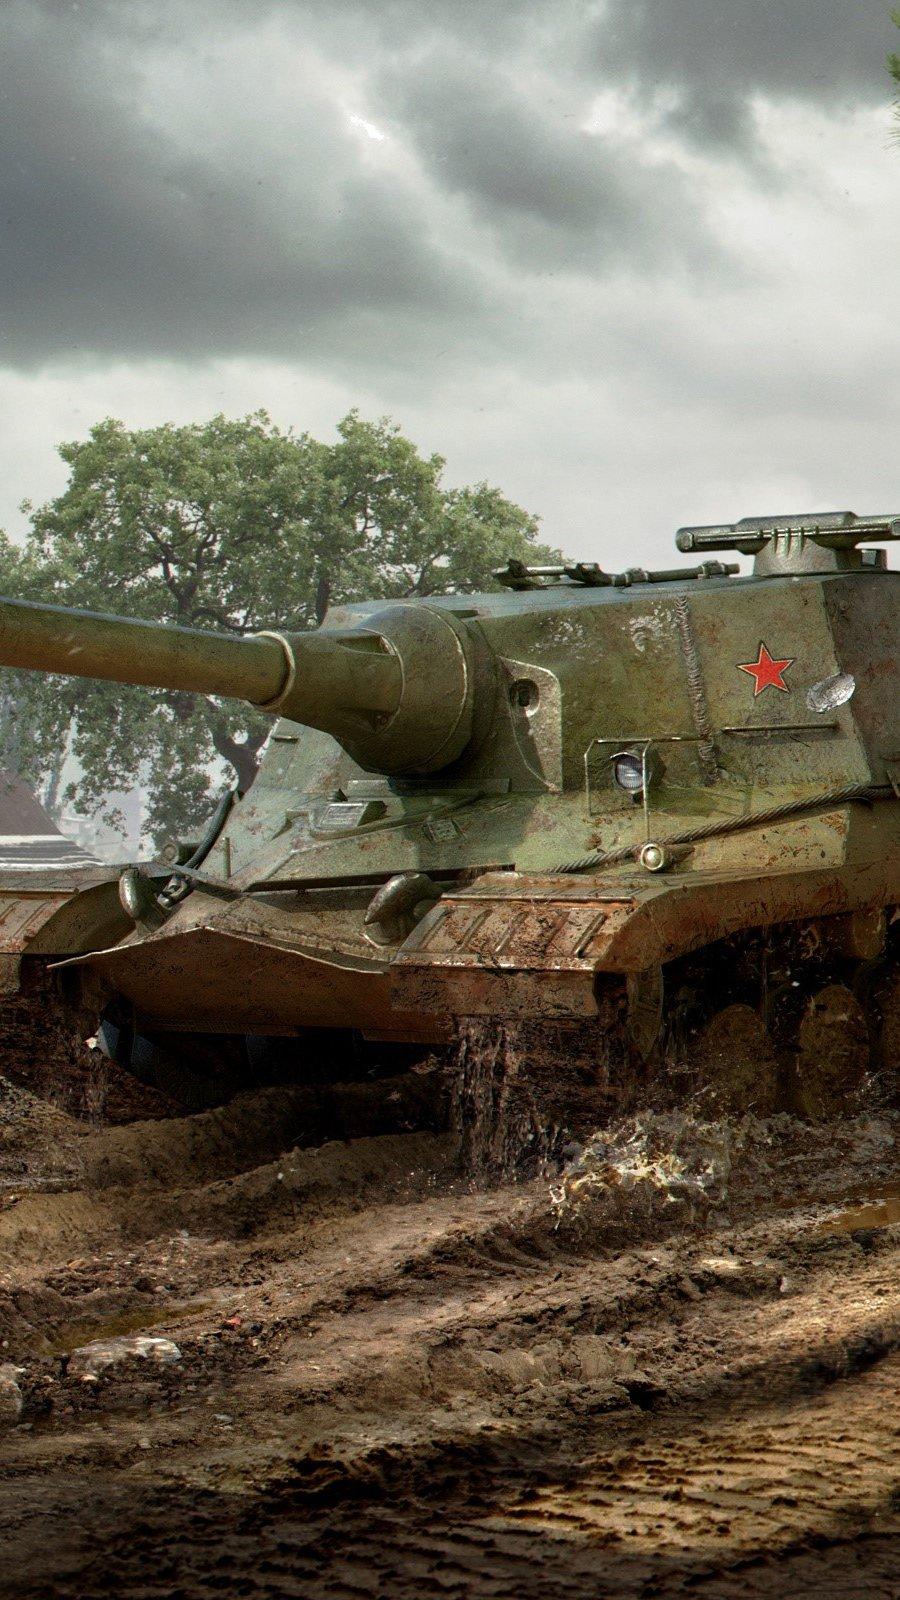 Wallpaper Object 268 of World Of Tanks Vertical